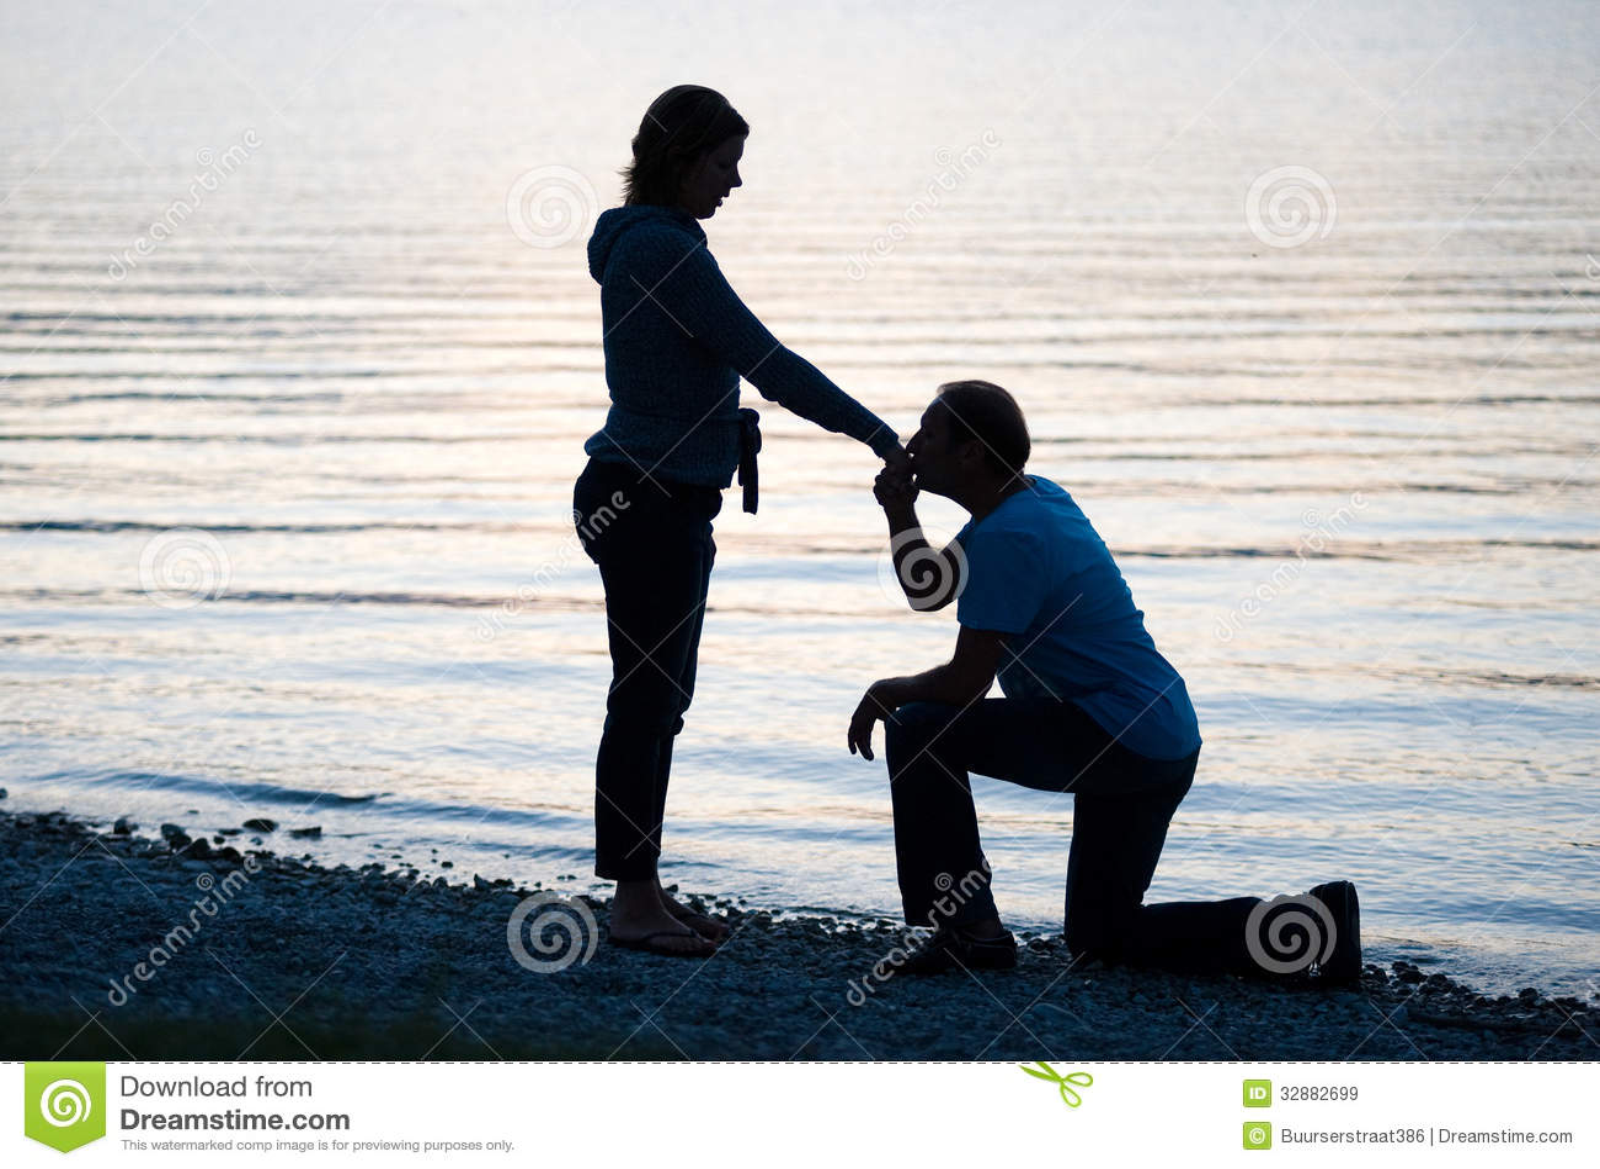 Фото подруга целует ноги подруге 3 фотография